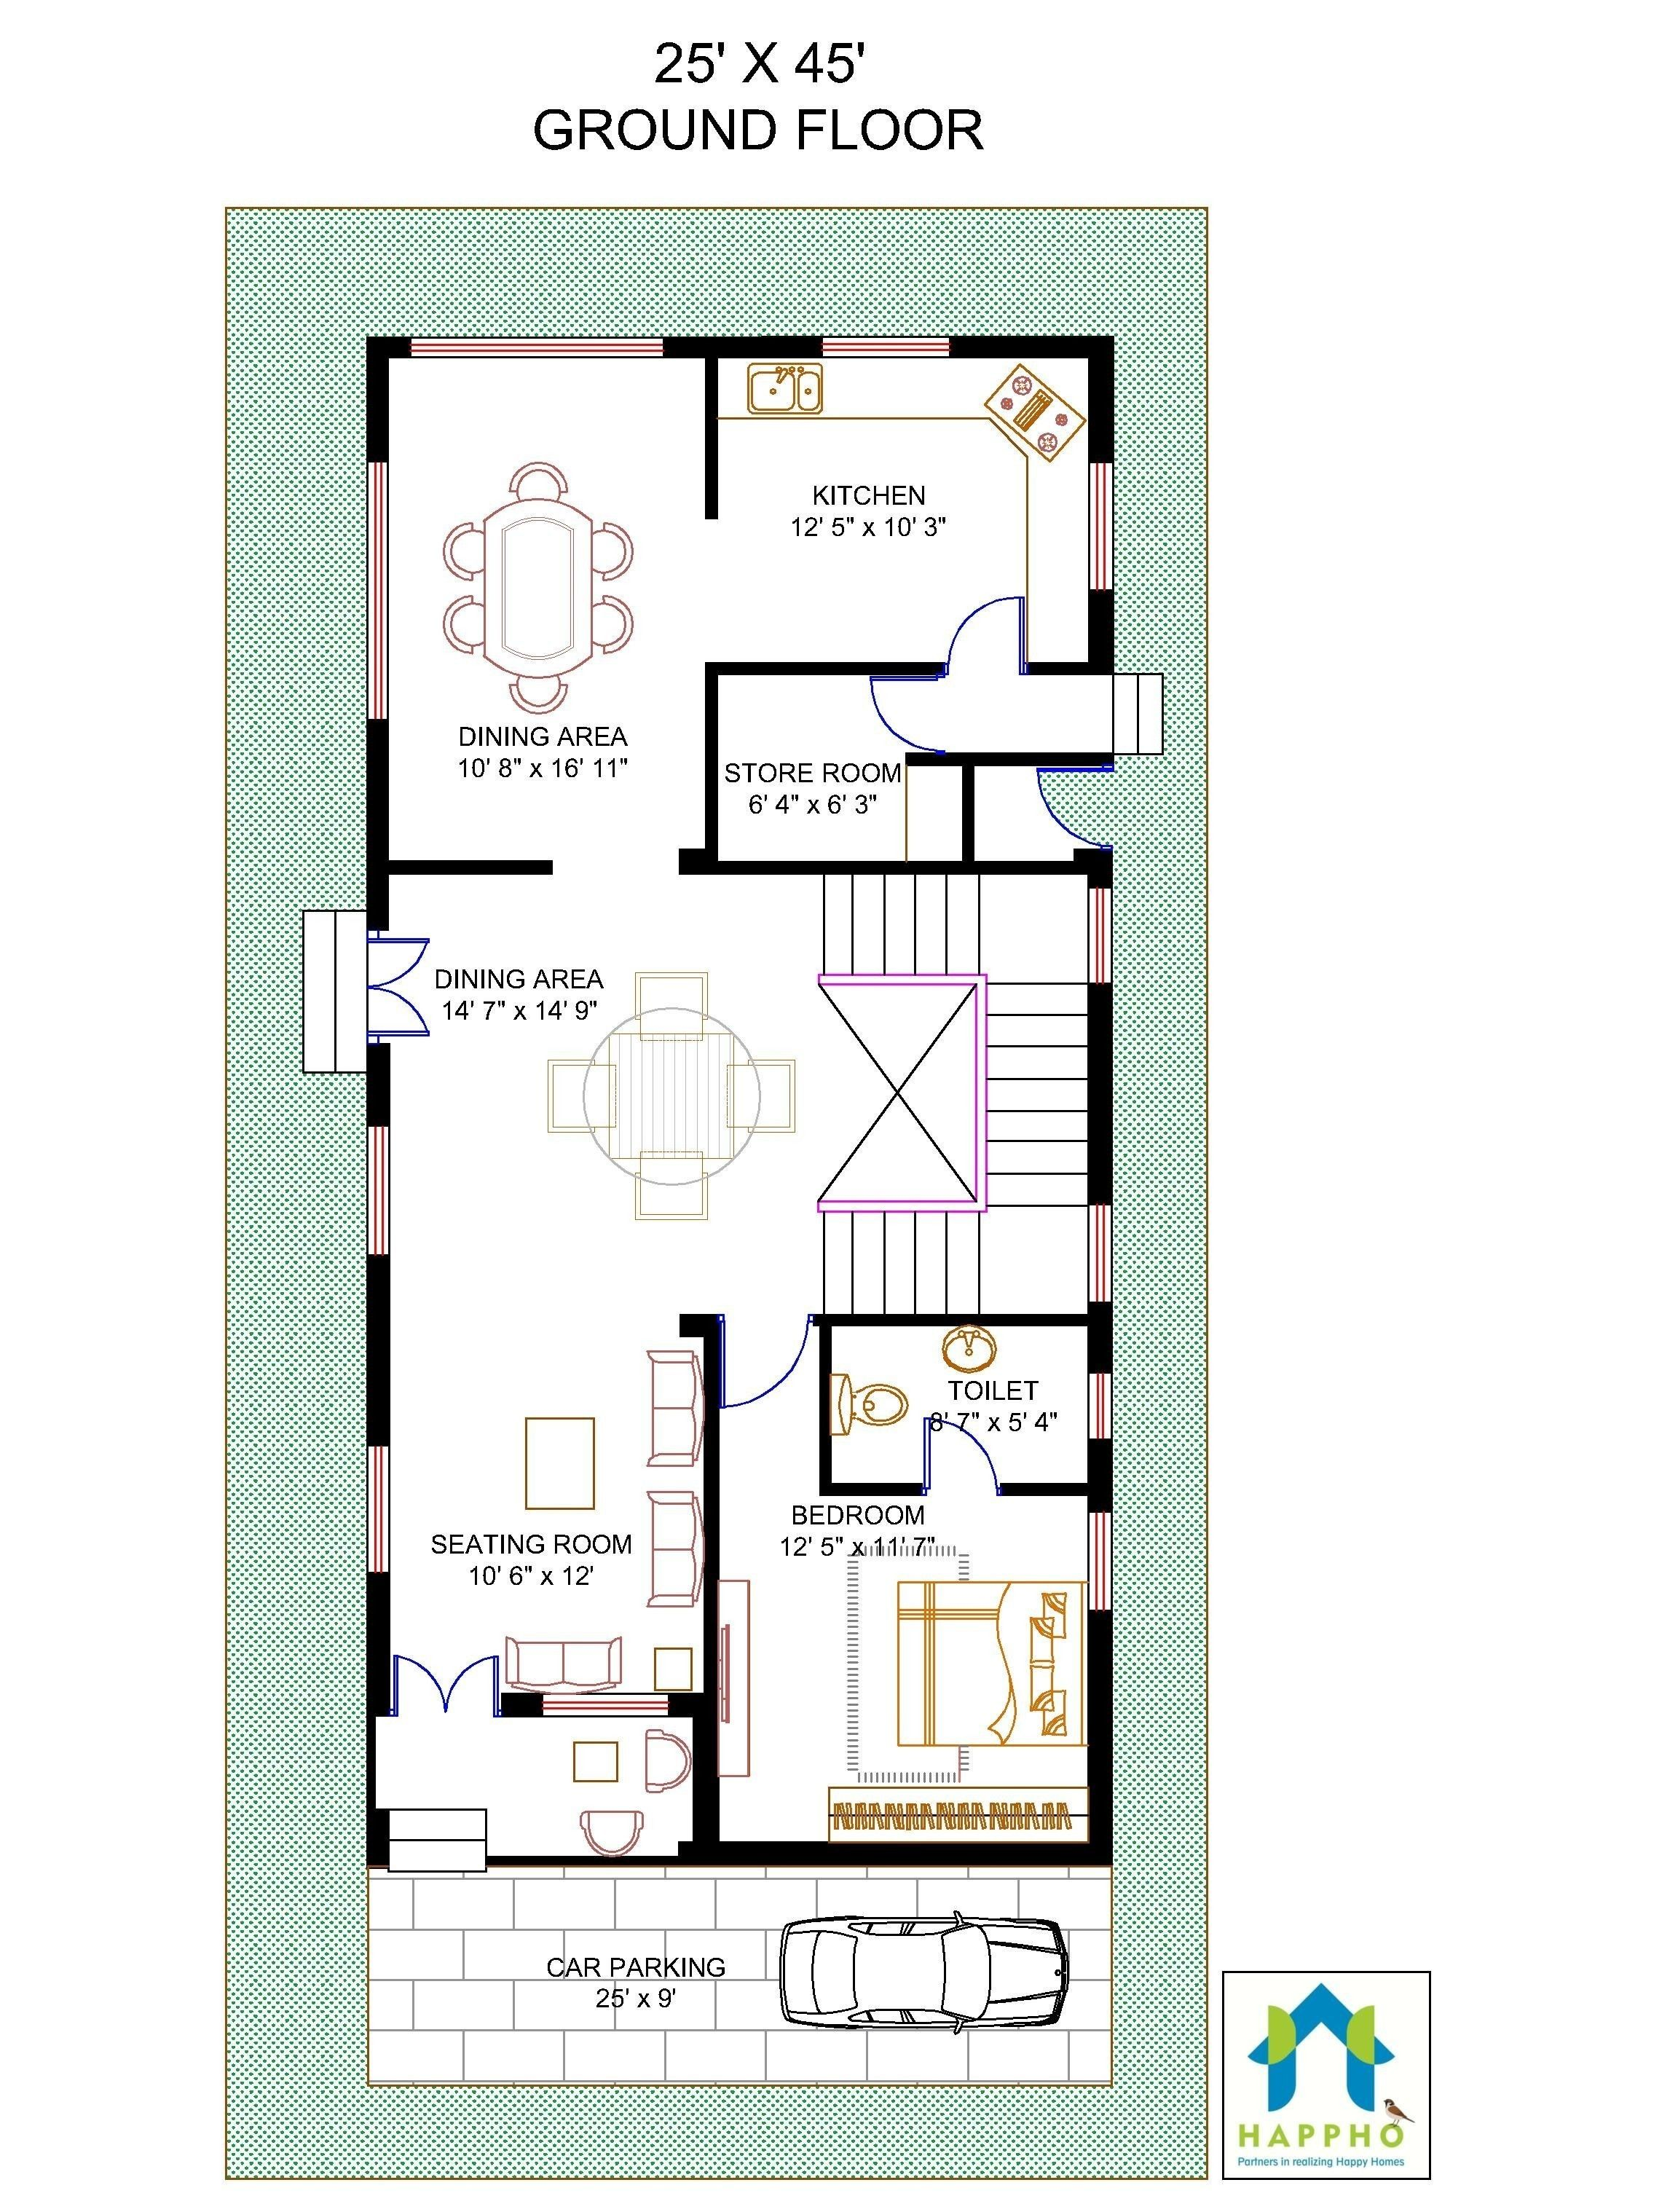 21 Impressive Apartment Layout Drawing To Copy At Your Apartment Shop House Plans Pole Barn House Plans Duplex House Plans